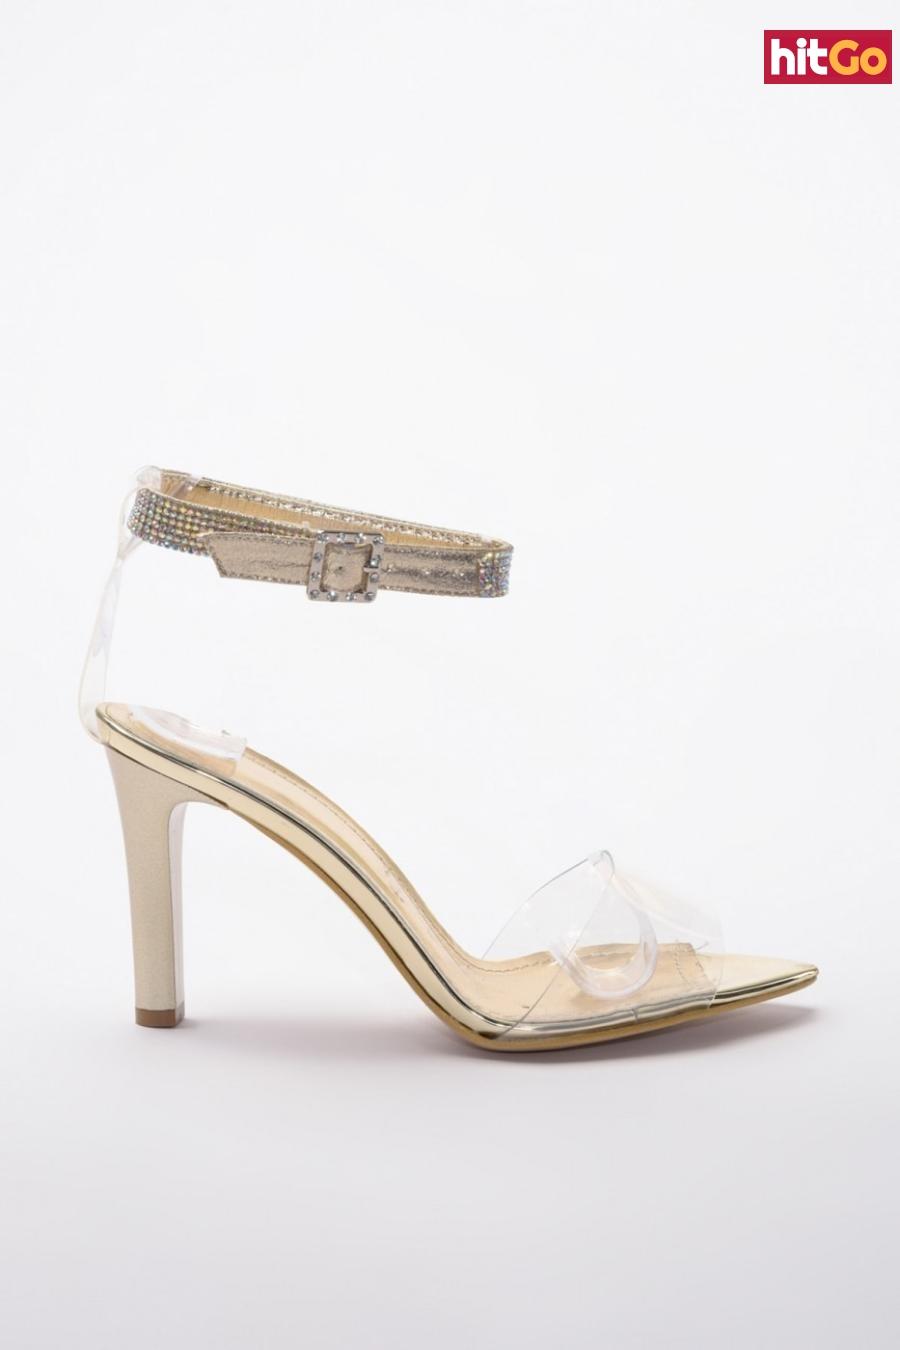 Trendyol Golden Stone Detailed Transparent Womens Classic Heels dámské 40